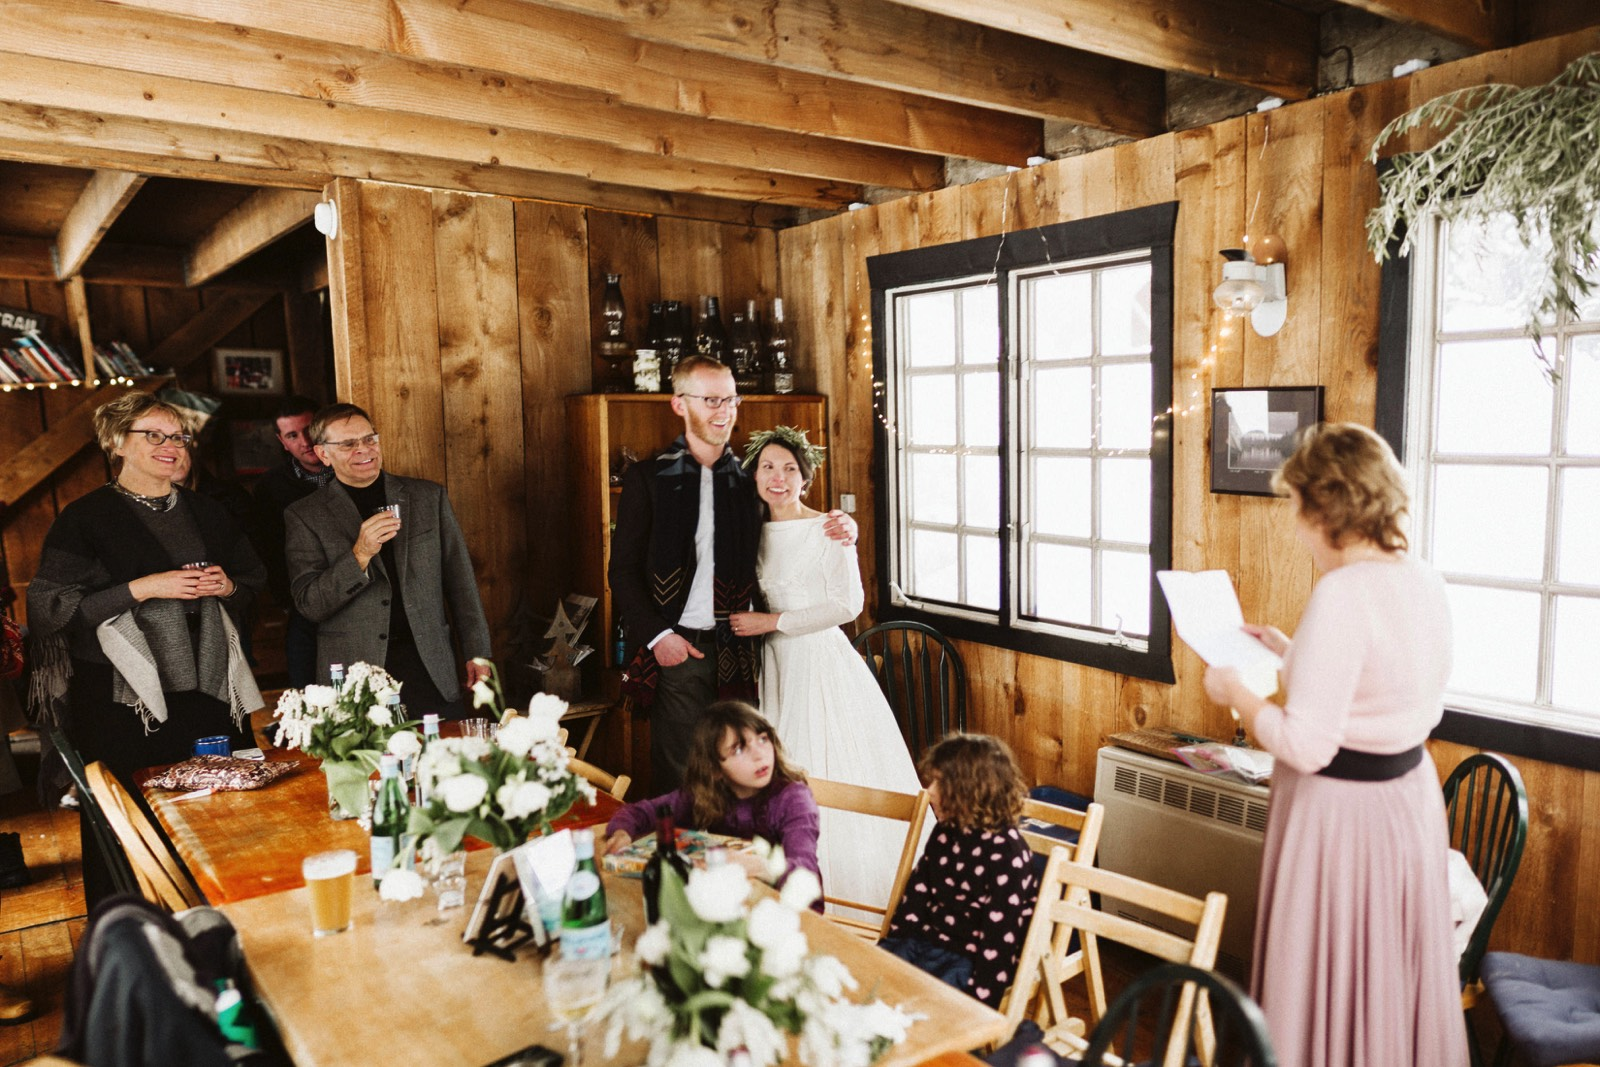 alpine-lakes-high-camp-winter-wedding-80 ALPINE LAKES HIGH CAMP WEDDING